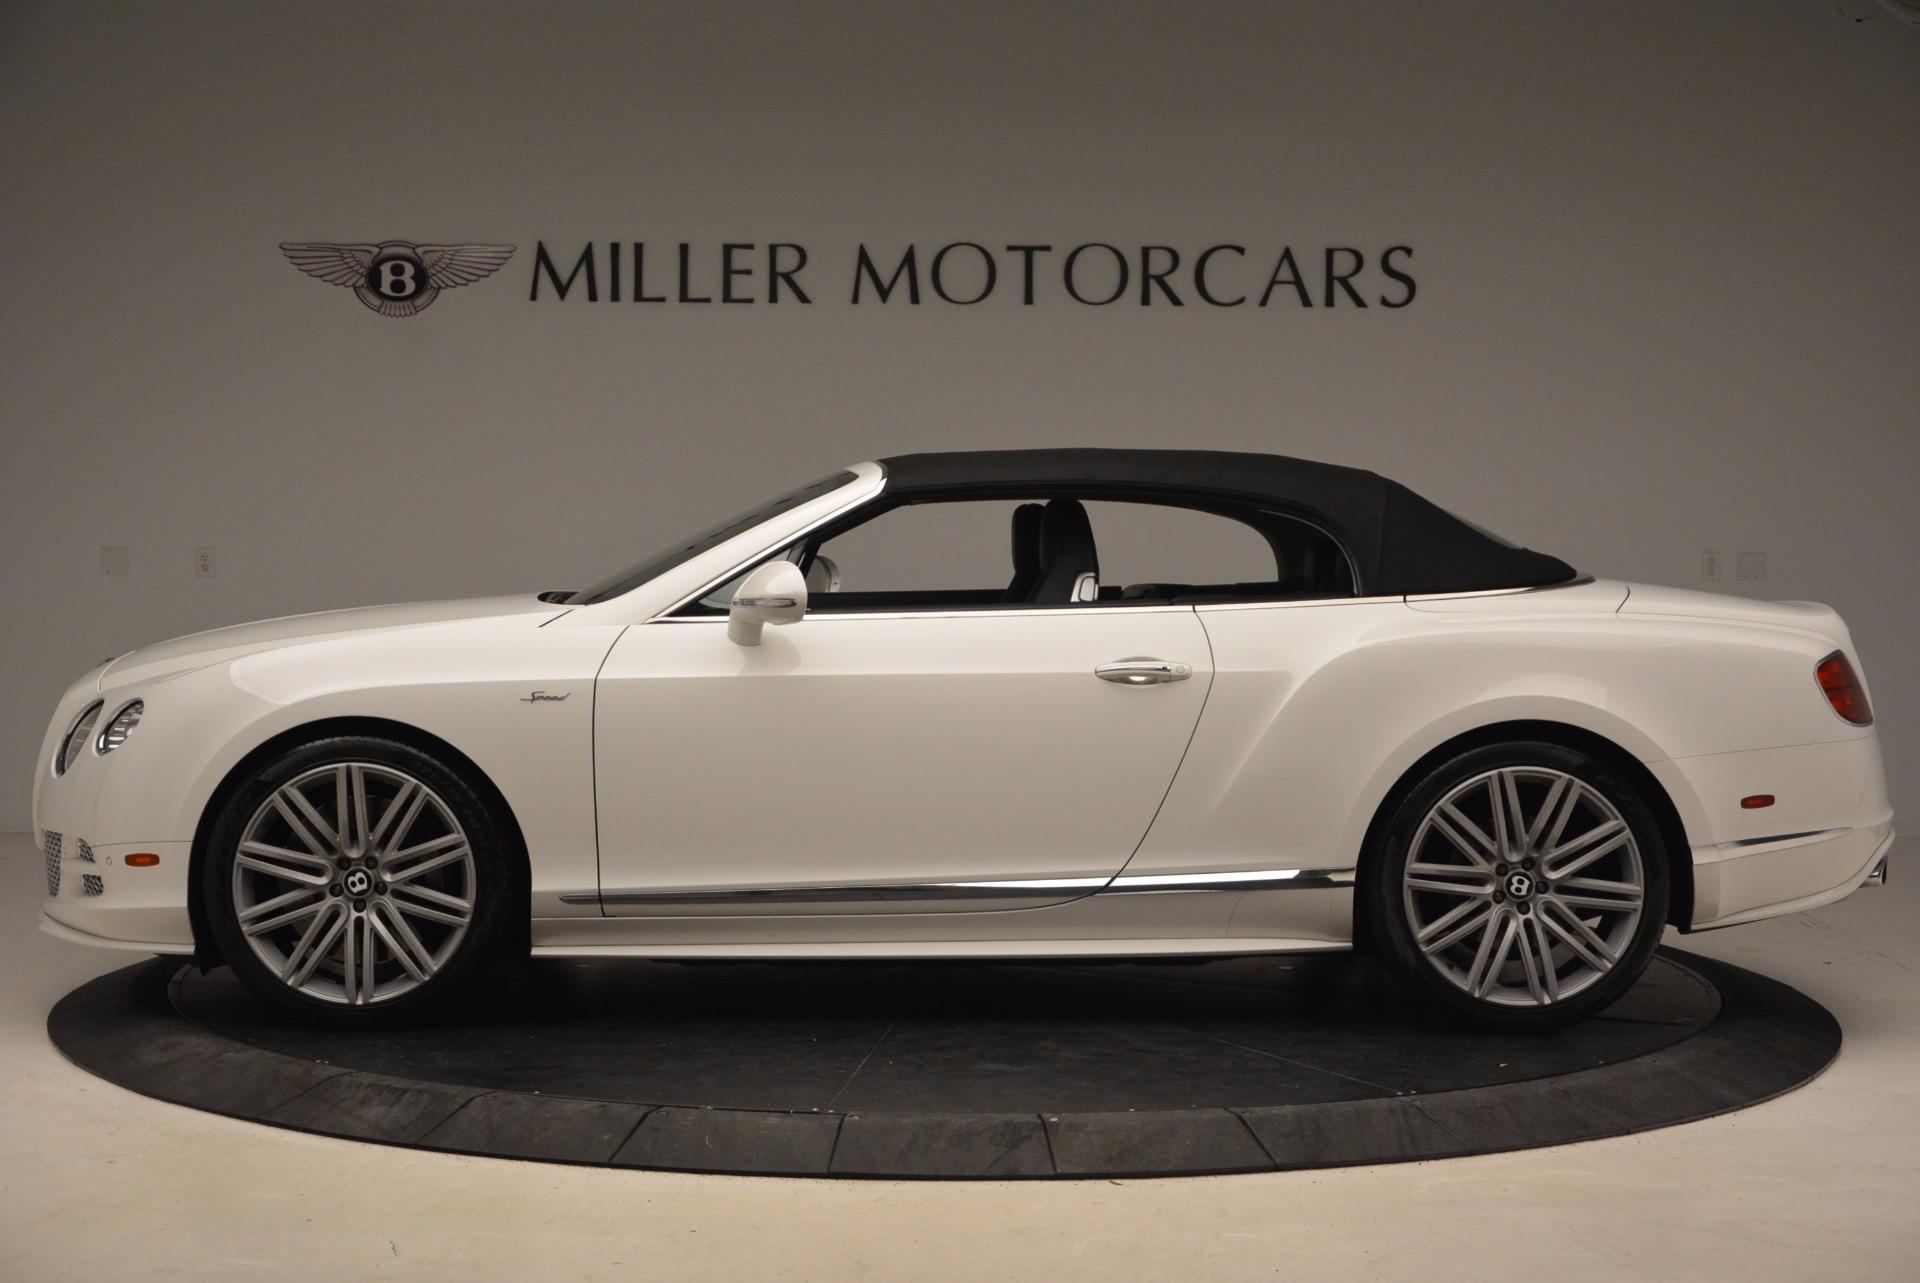 Used 2015 Bentley Continental GT Speed For Sale In Westport, CT 1714_p15